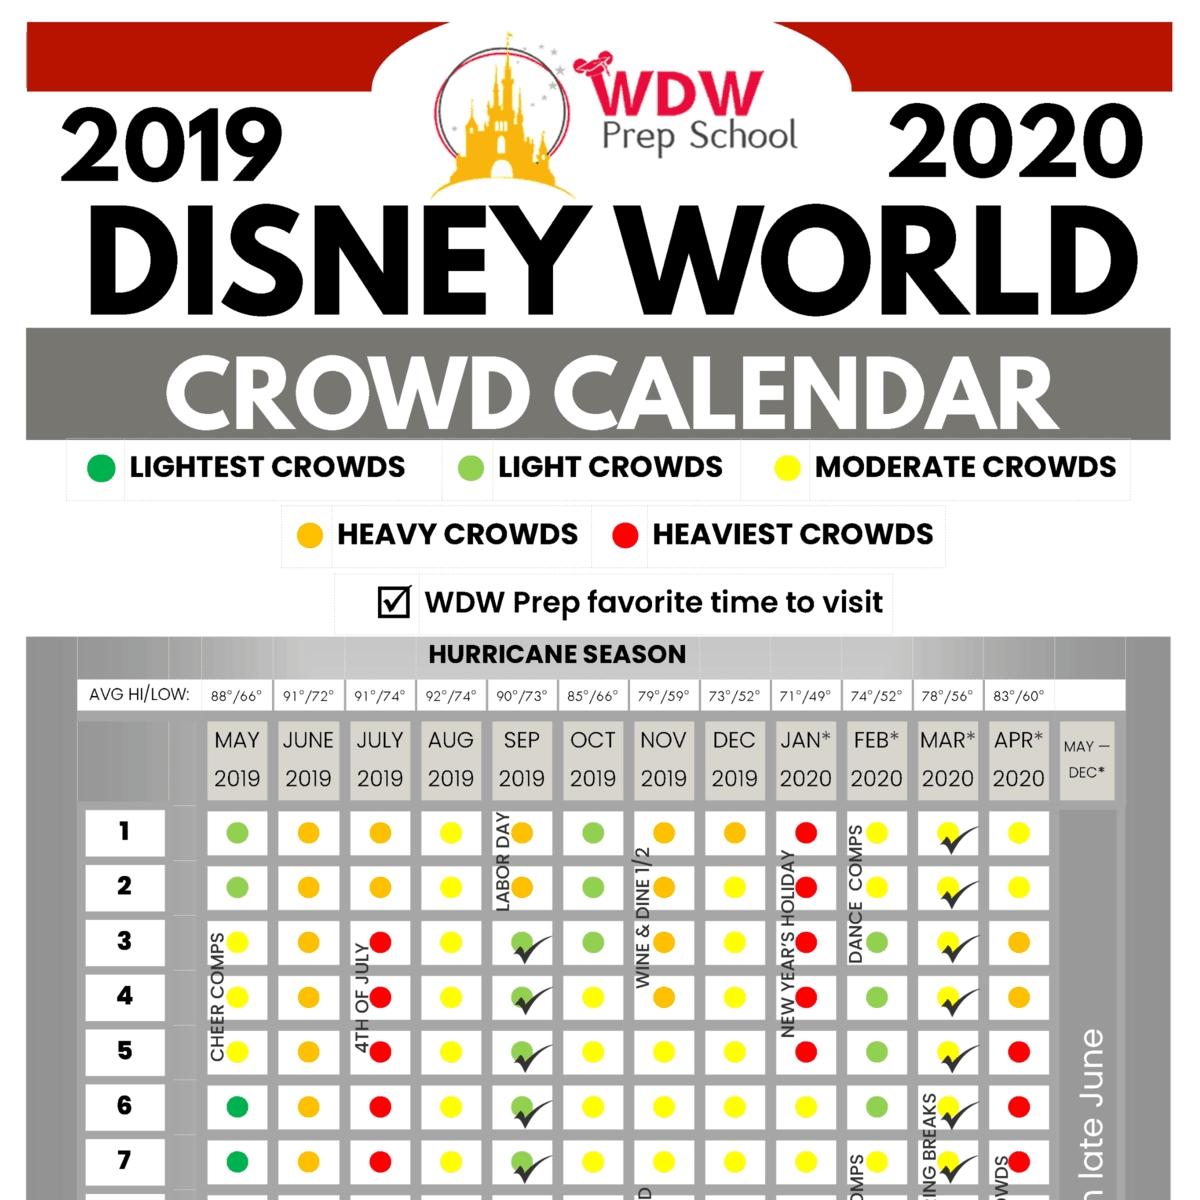 Disney World 2019 & 2020 Crowd Calendar (Best Times To Go-Walt Disney World Crowd Calendar January 2020